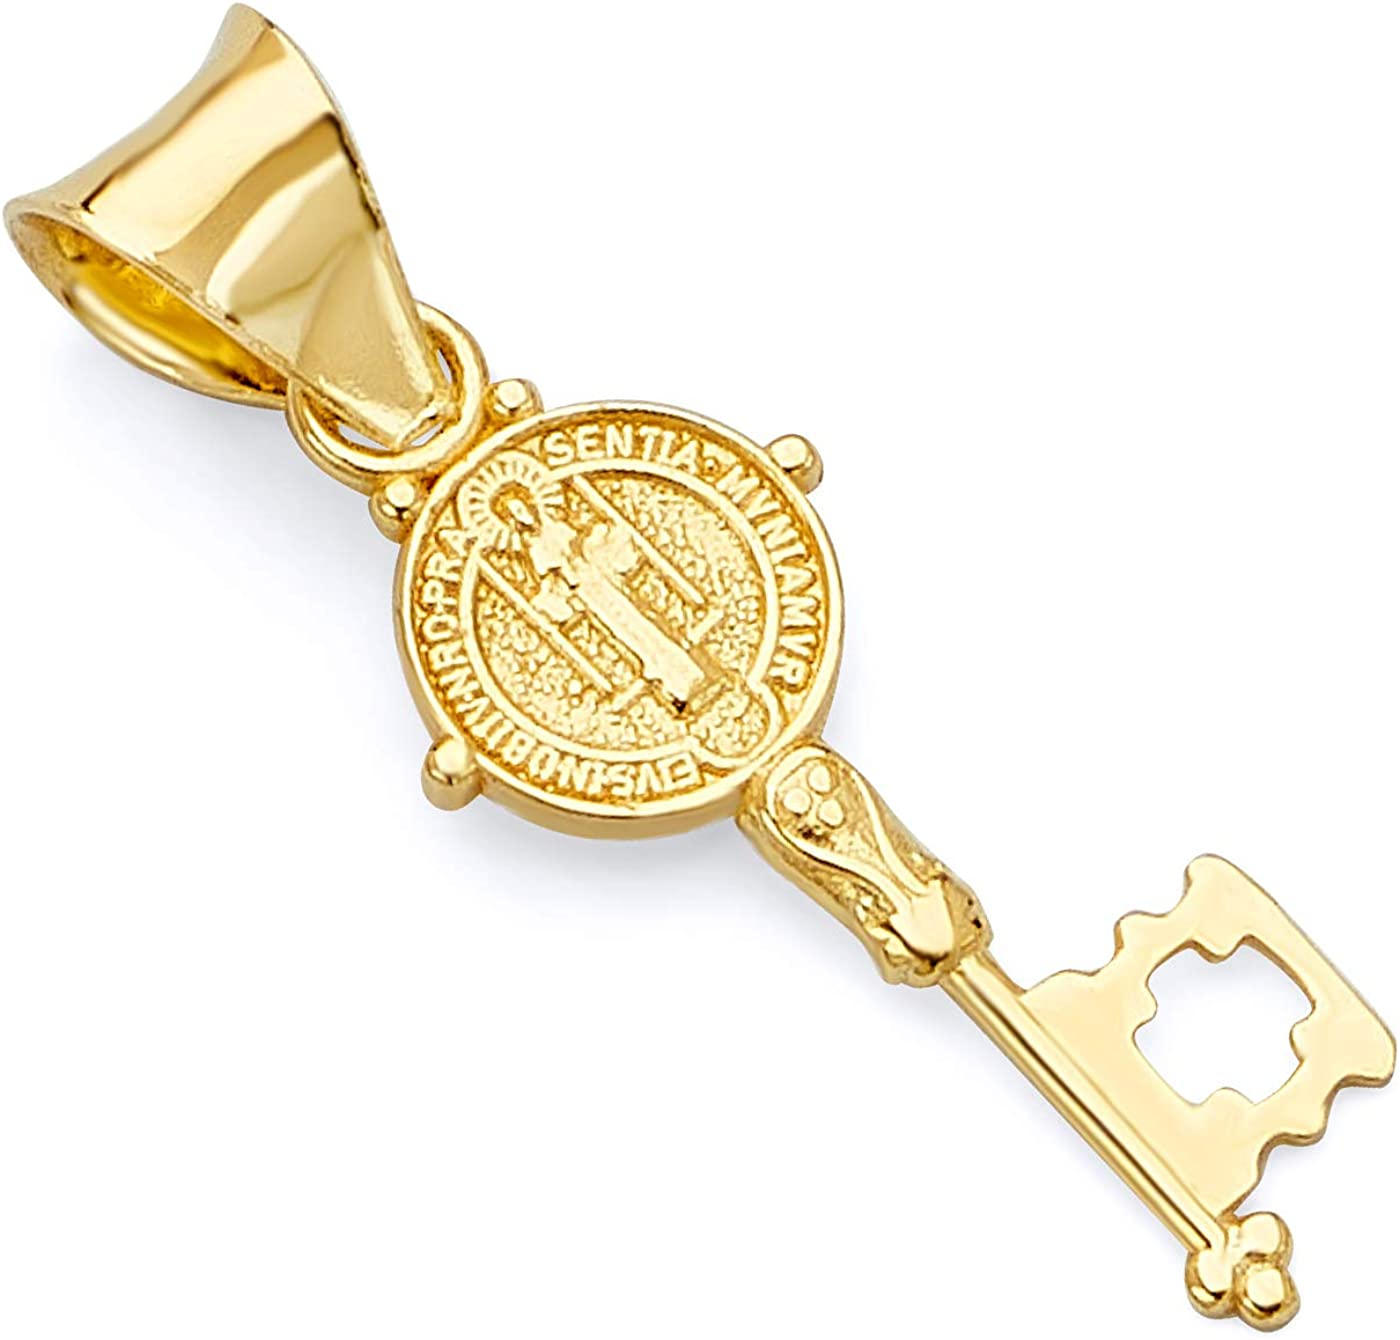 TWJC 14k REAL Yellow Gold Religious Benito Large-scale sale Colorado Springs Mall Penda Charm Key Saint